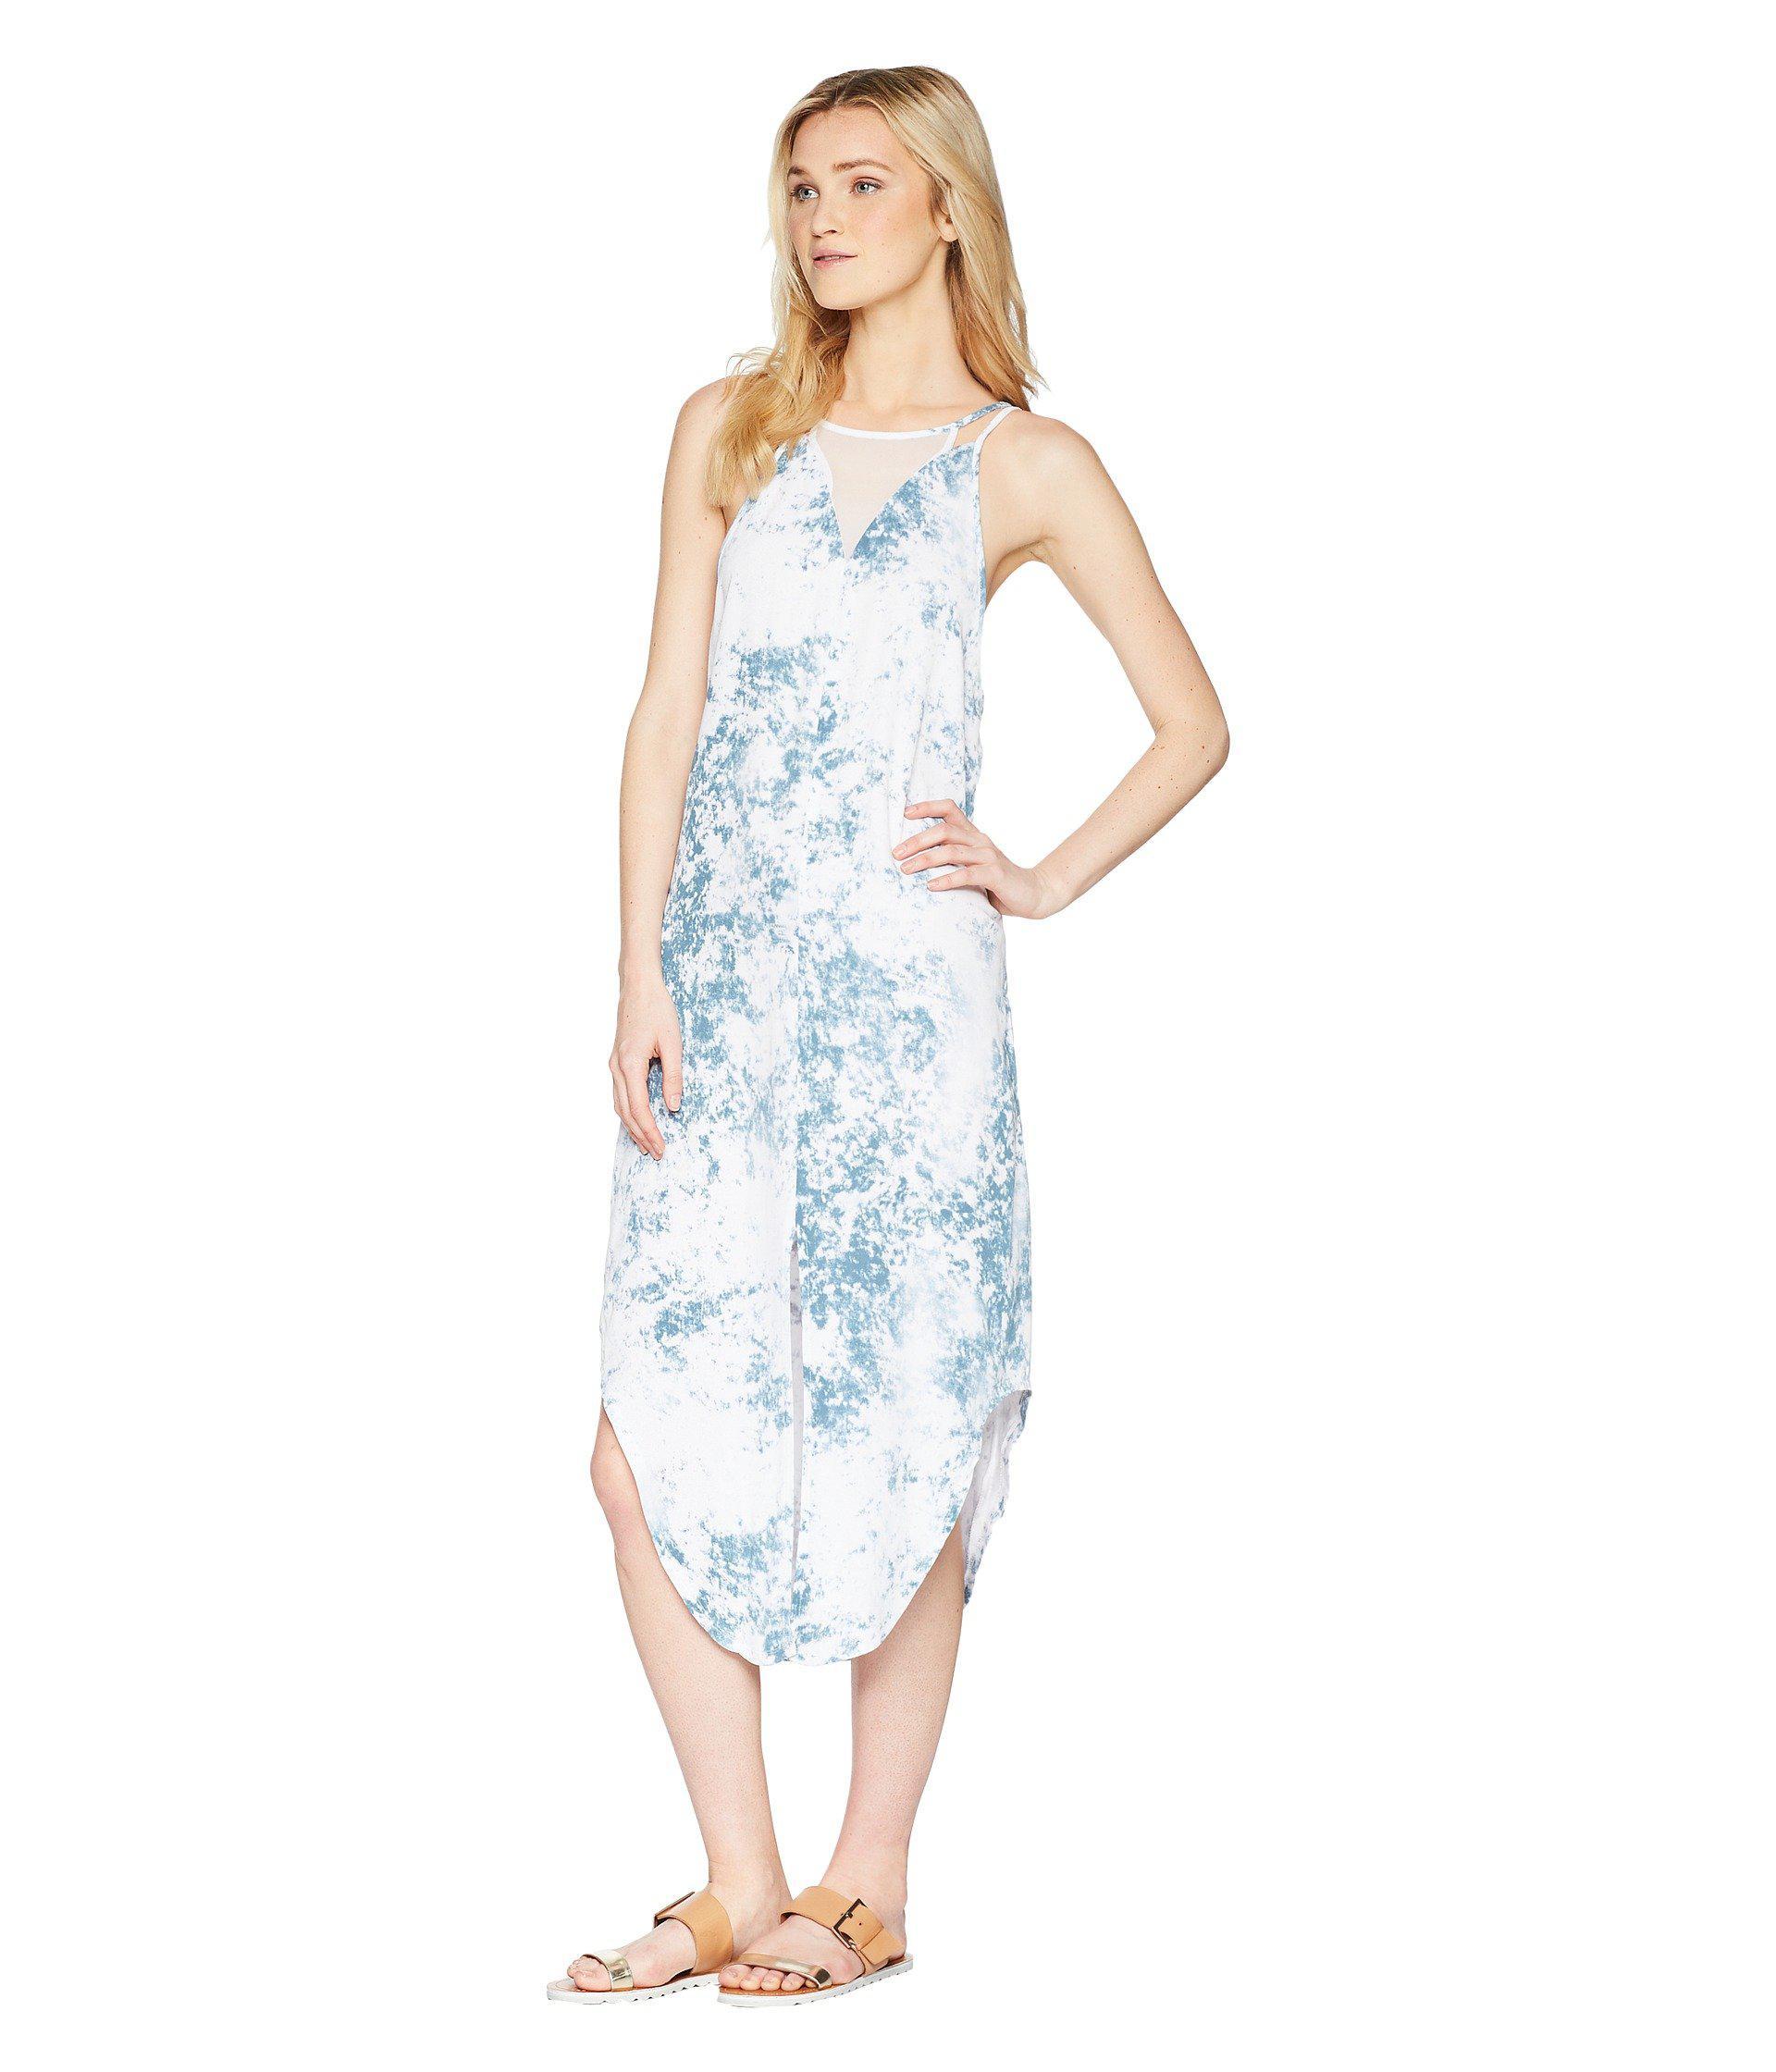 White Wash Reversible Wash Women's Dress Reversible White Dress Women's 9YbDeWIEH2